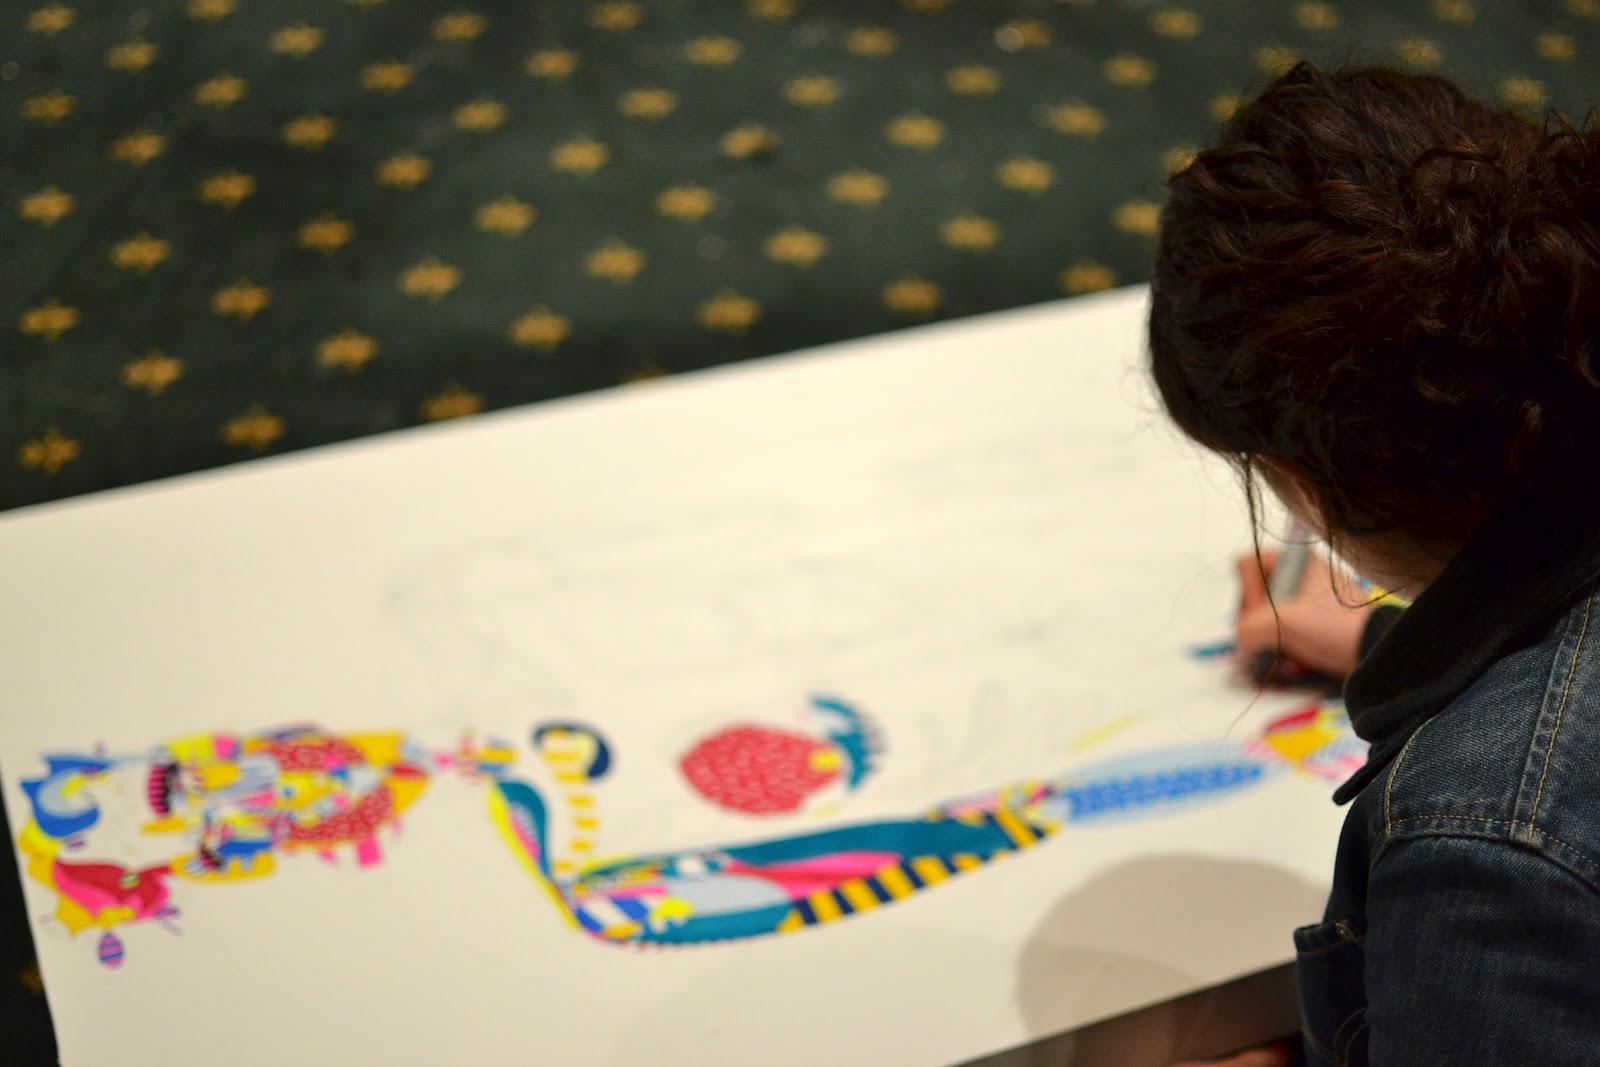 Acid Midget: Graffiti artist Andre does Kitsune Parisien